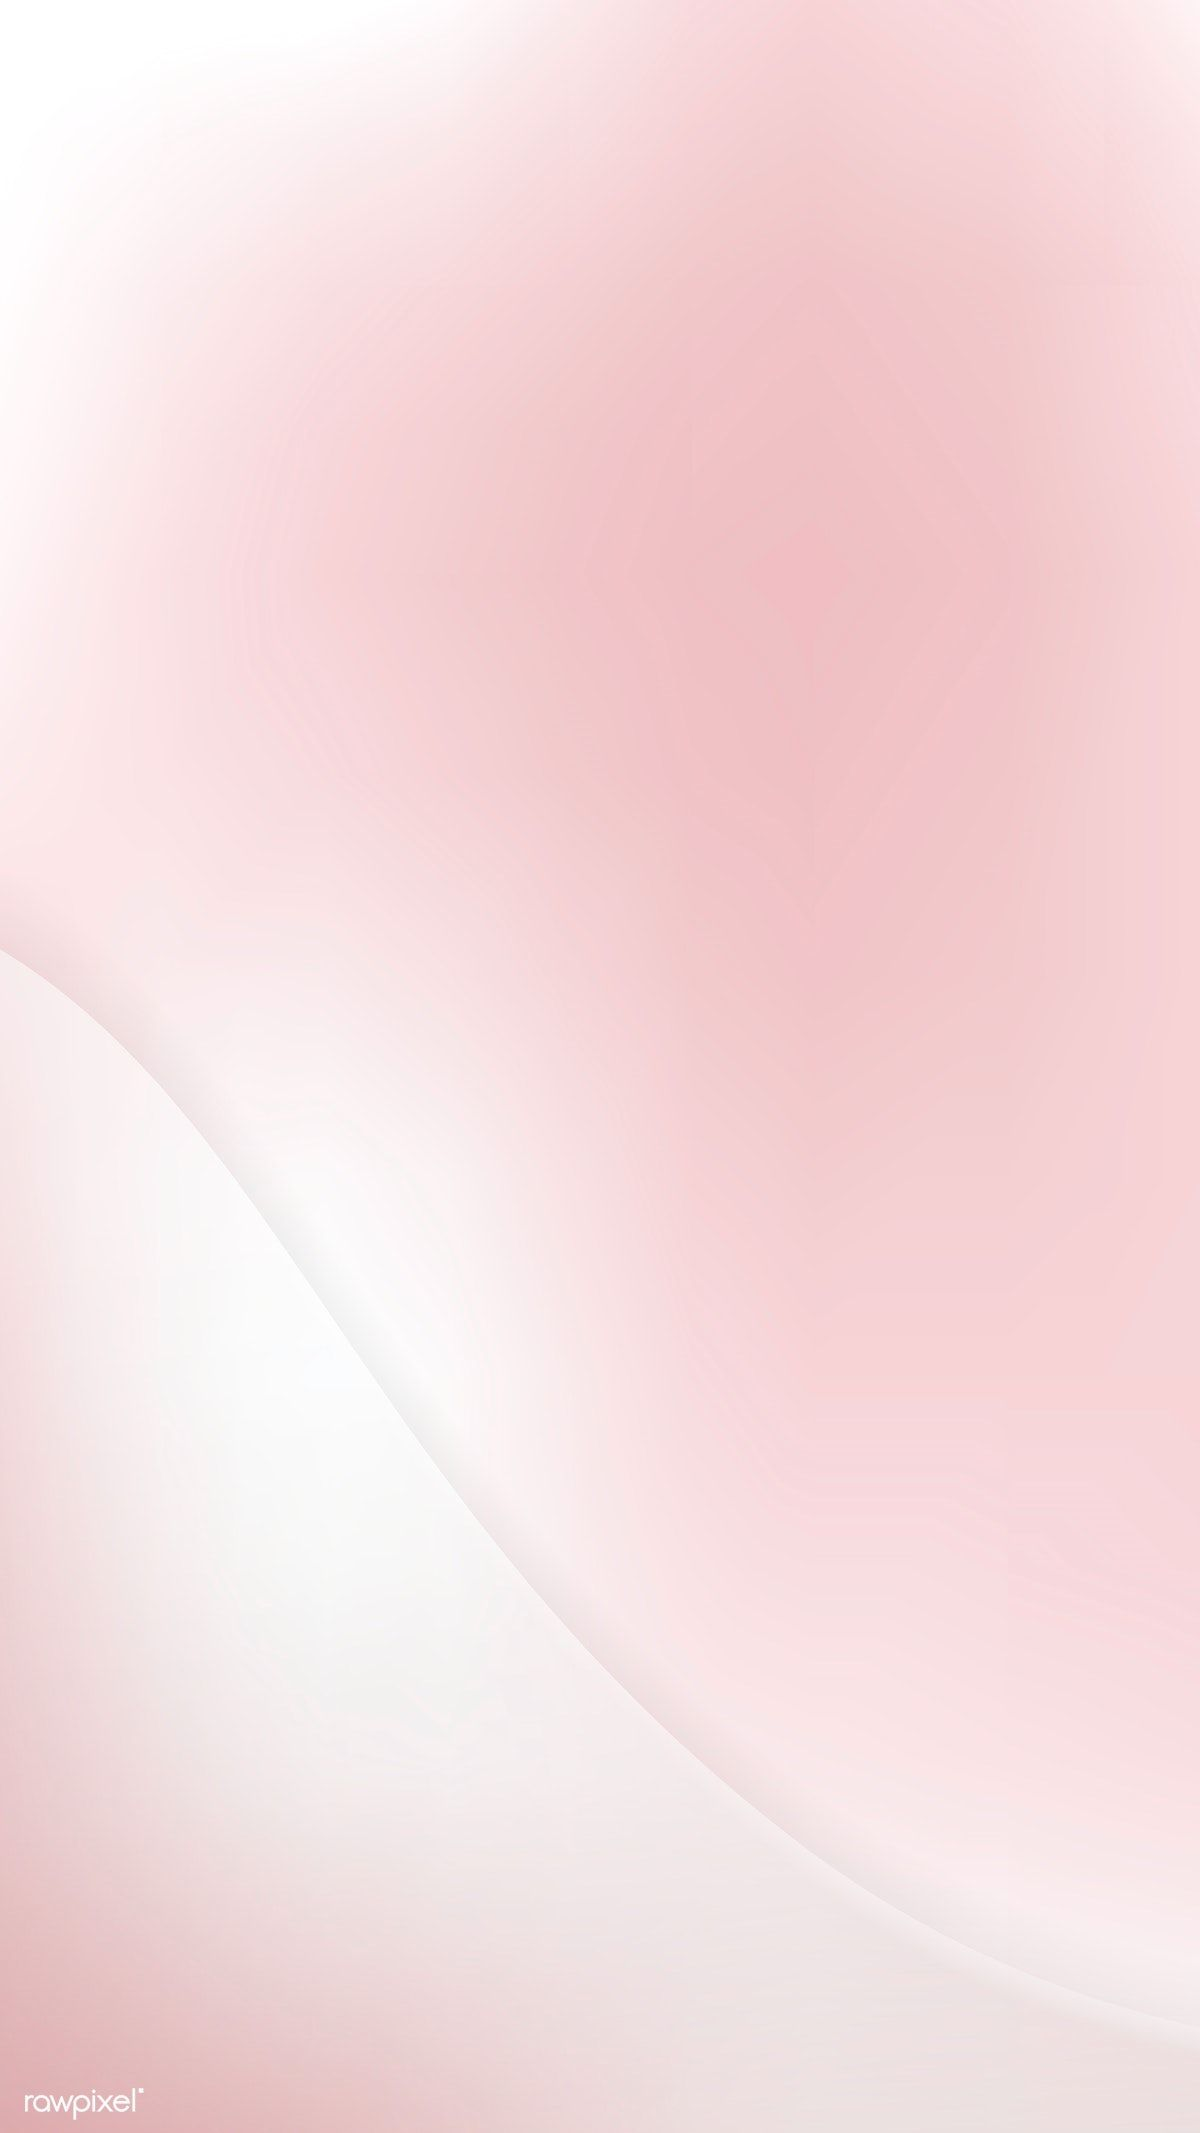 Download Premium Vector Of Pink Feminine Geometric Background Vector 679969 Geometric Wallpaper Iphone Geometric Background Pink Wallpaper Iphone